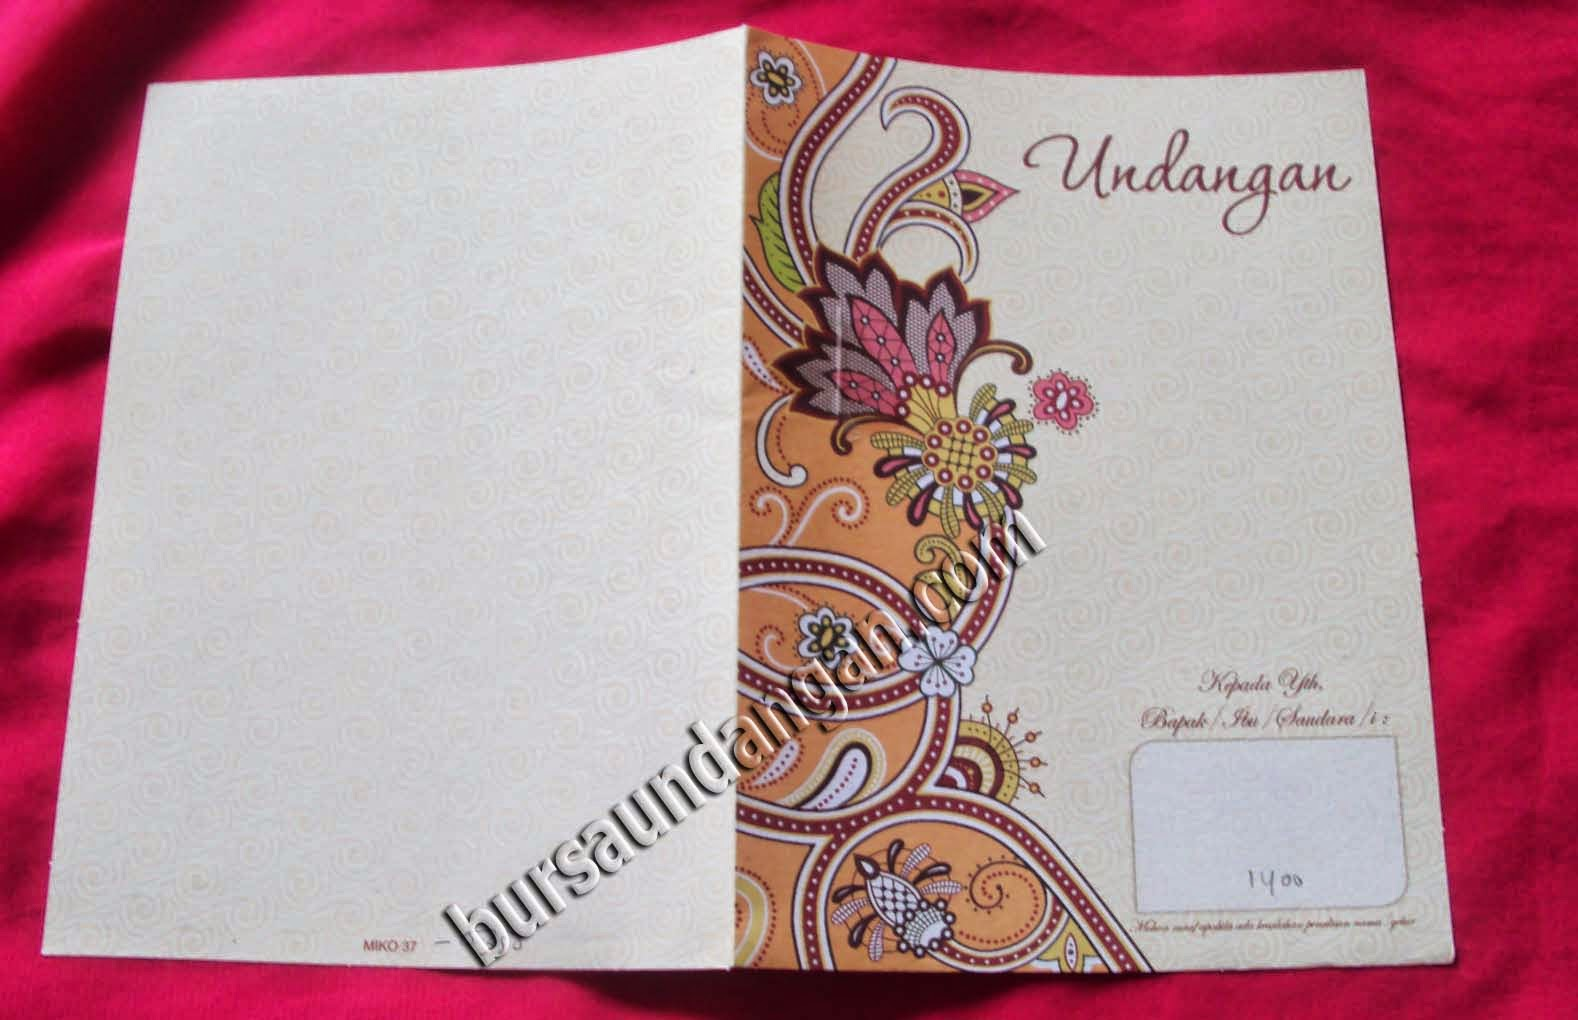 Desain Kartu Undangan Pernikahan Modern - Kode MIKO 37   BURSA KARTU ...